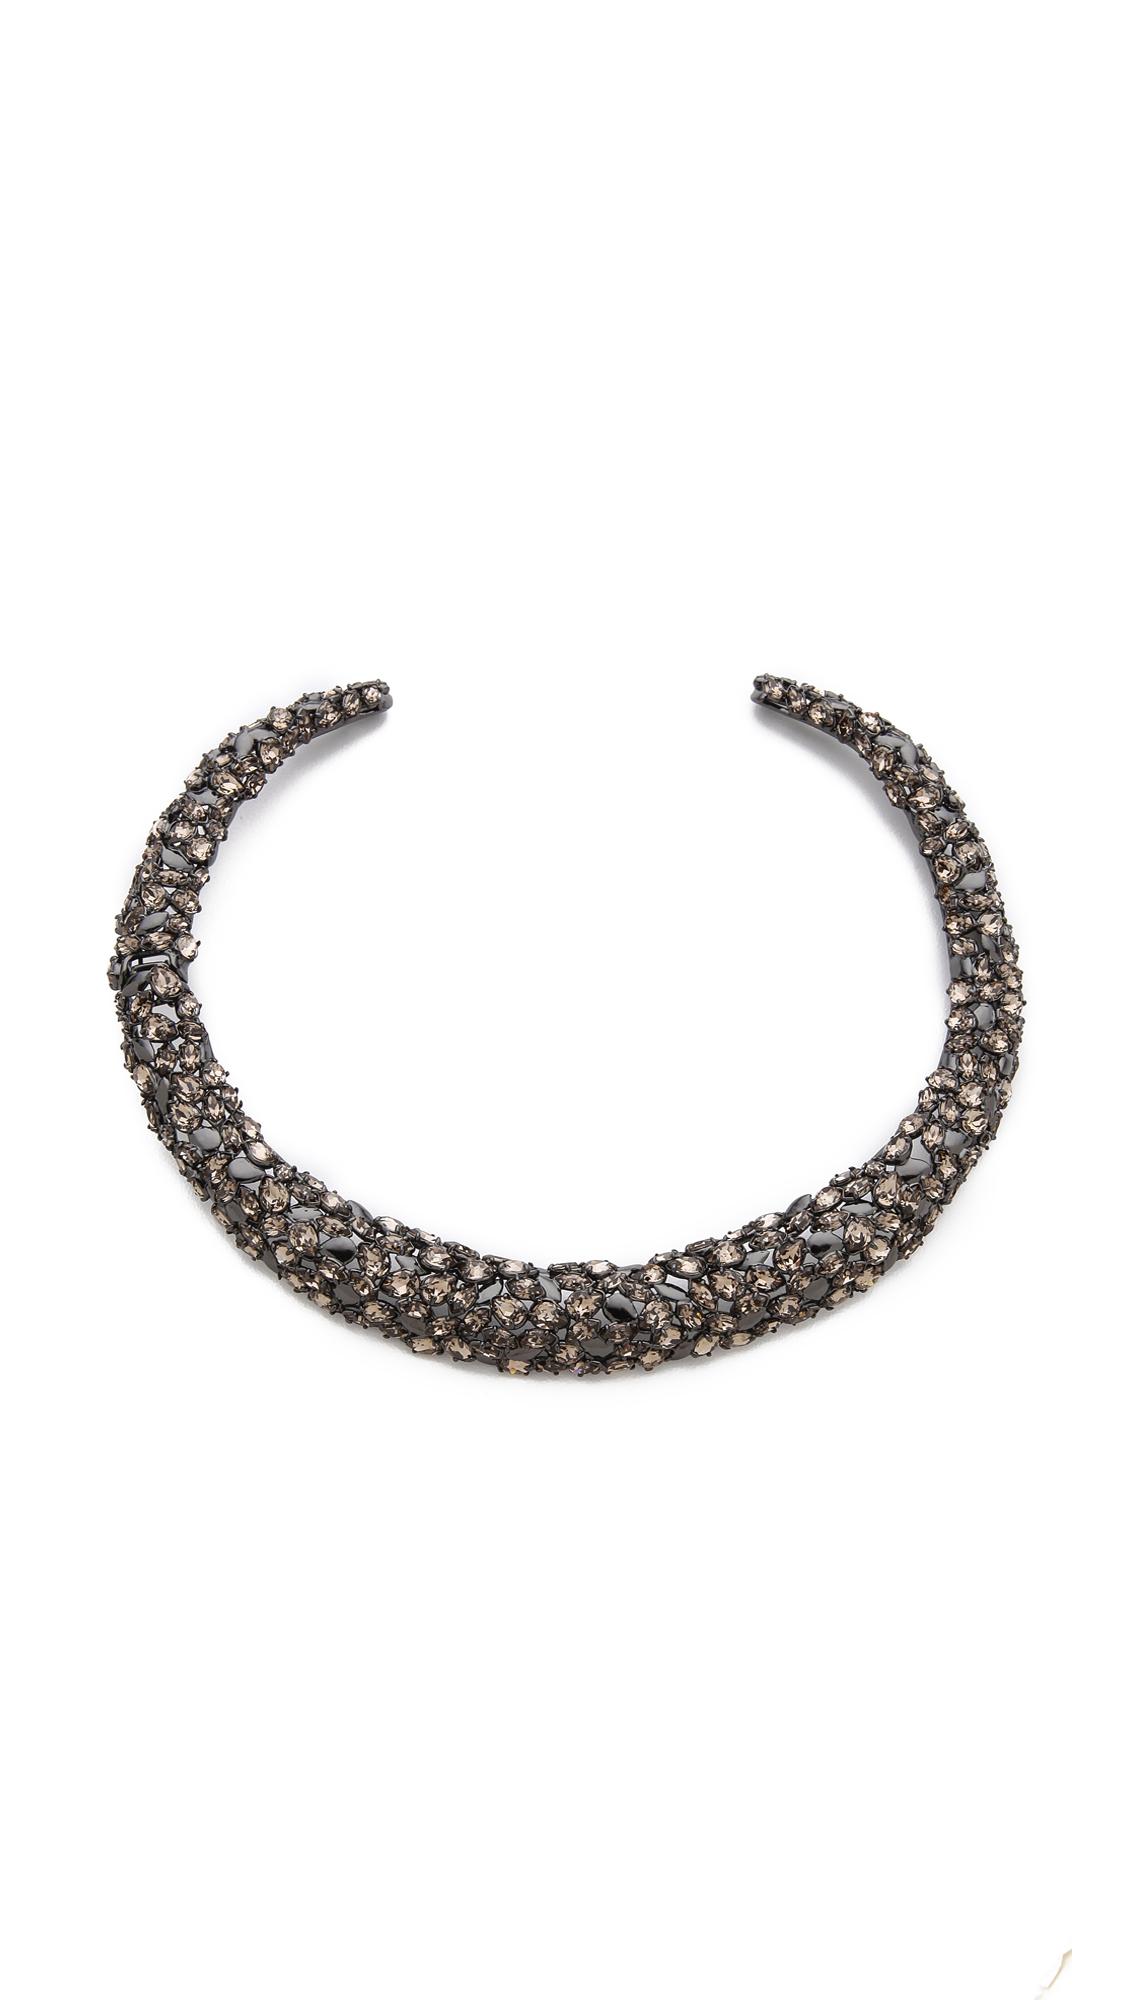 Alexis Bittar Hinged Nova Collar Necklace In Multicolor Multi